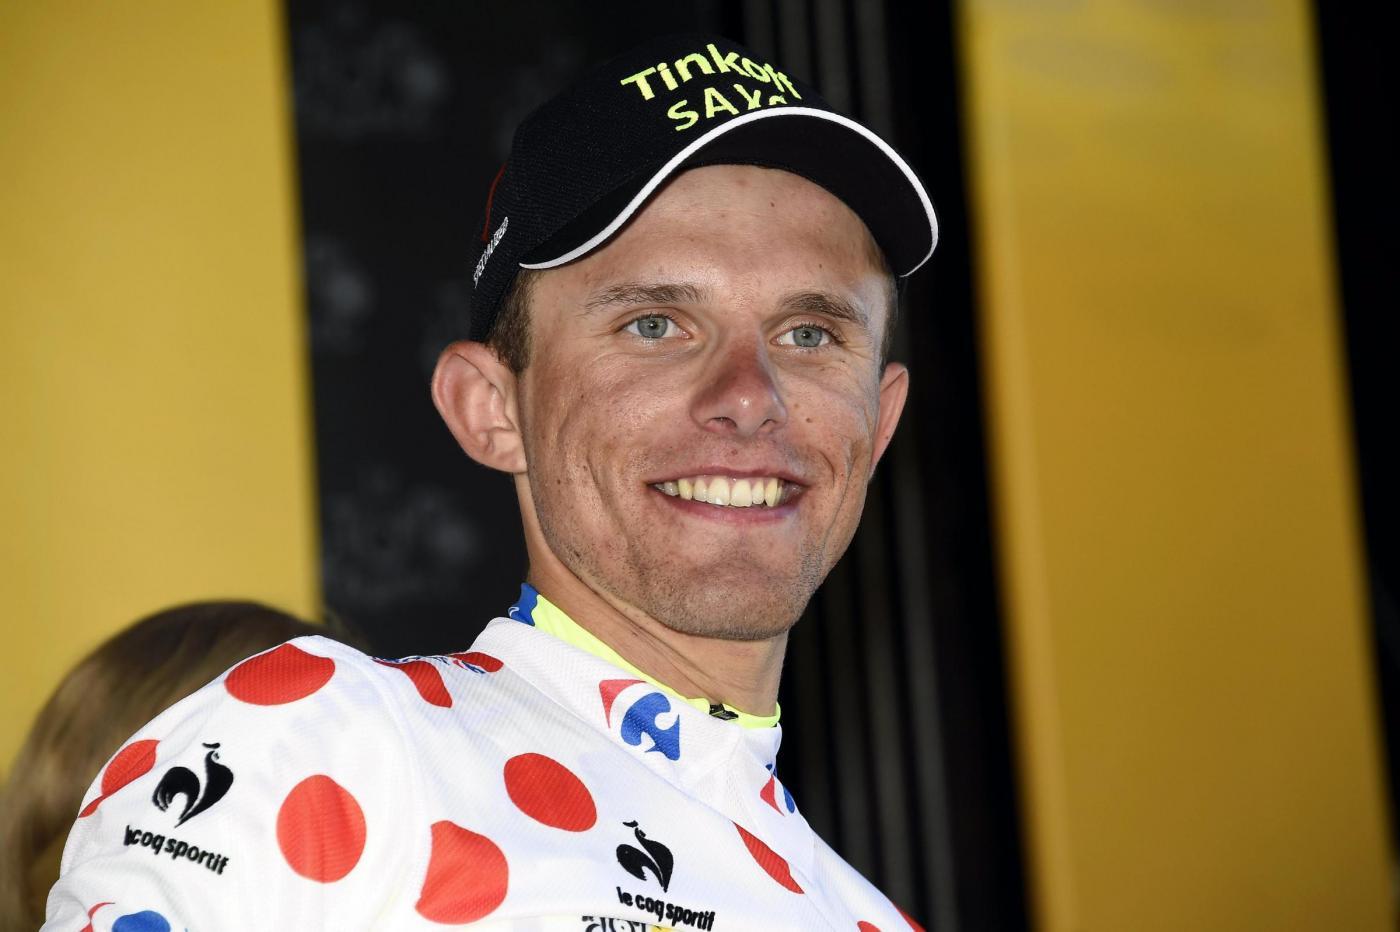 Tour de France 2014: bis di Majka sui Pirenei, Nibali scherza con gli avversari